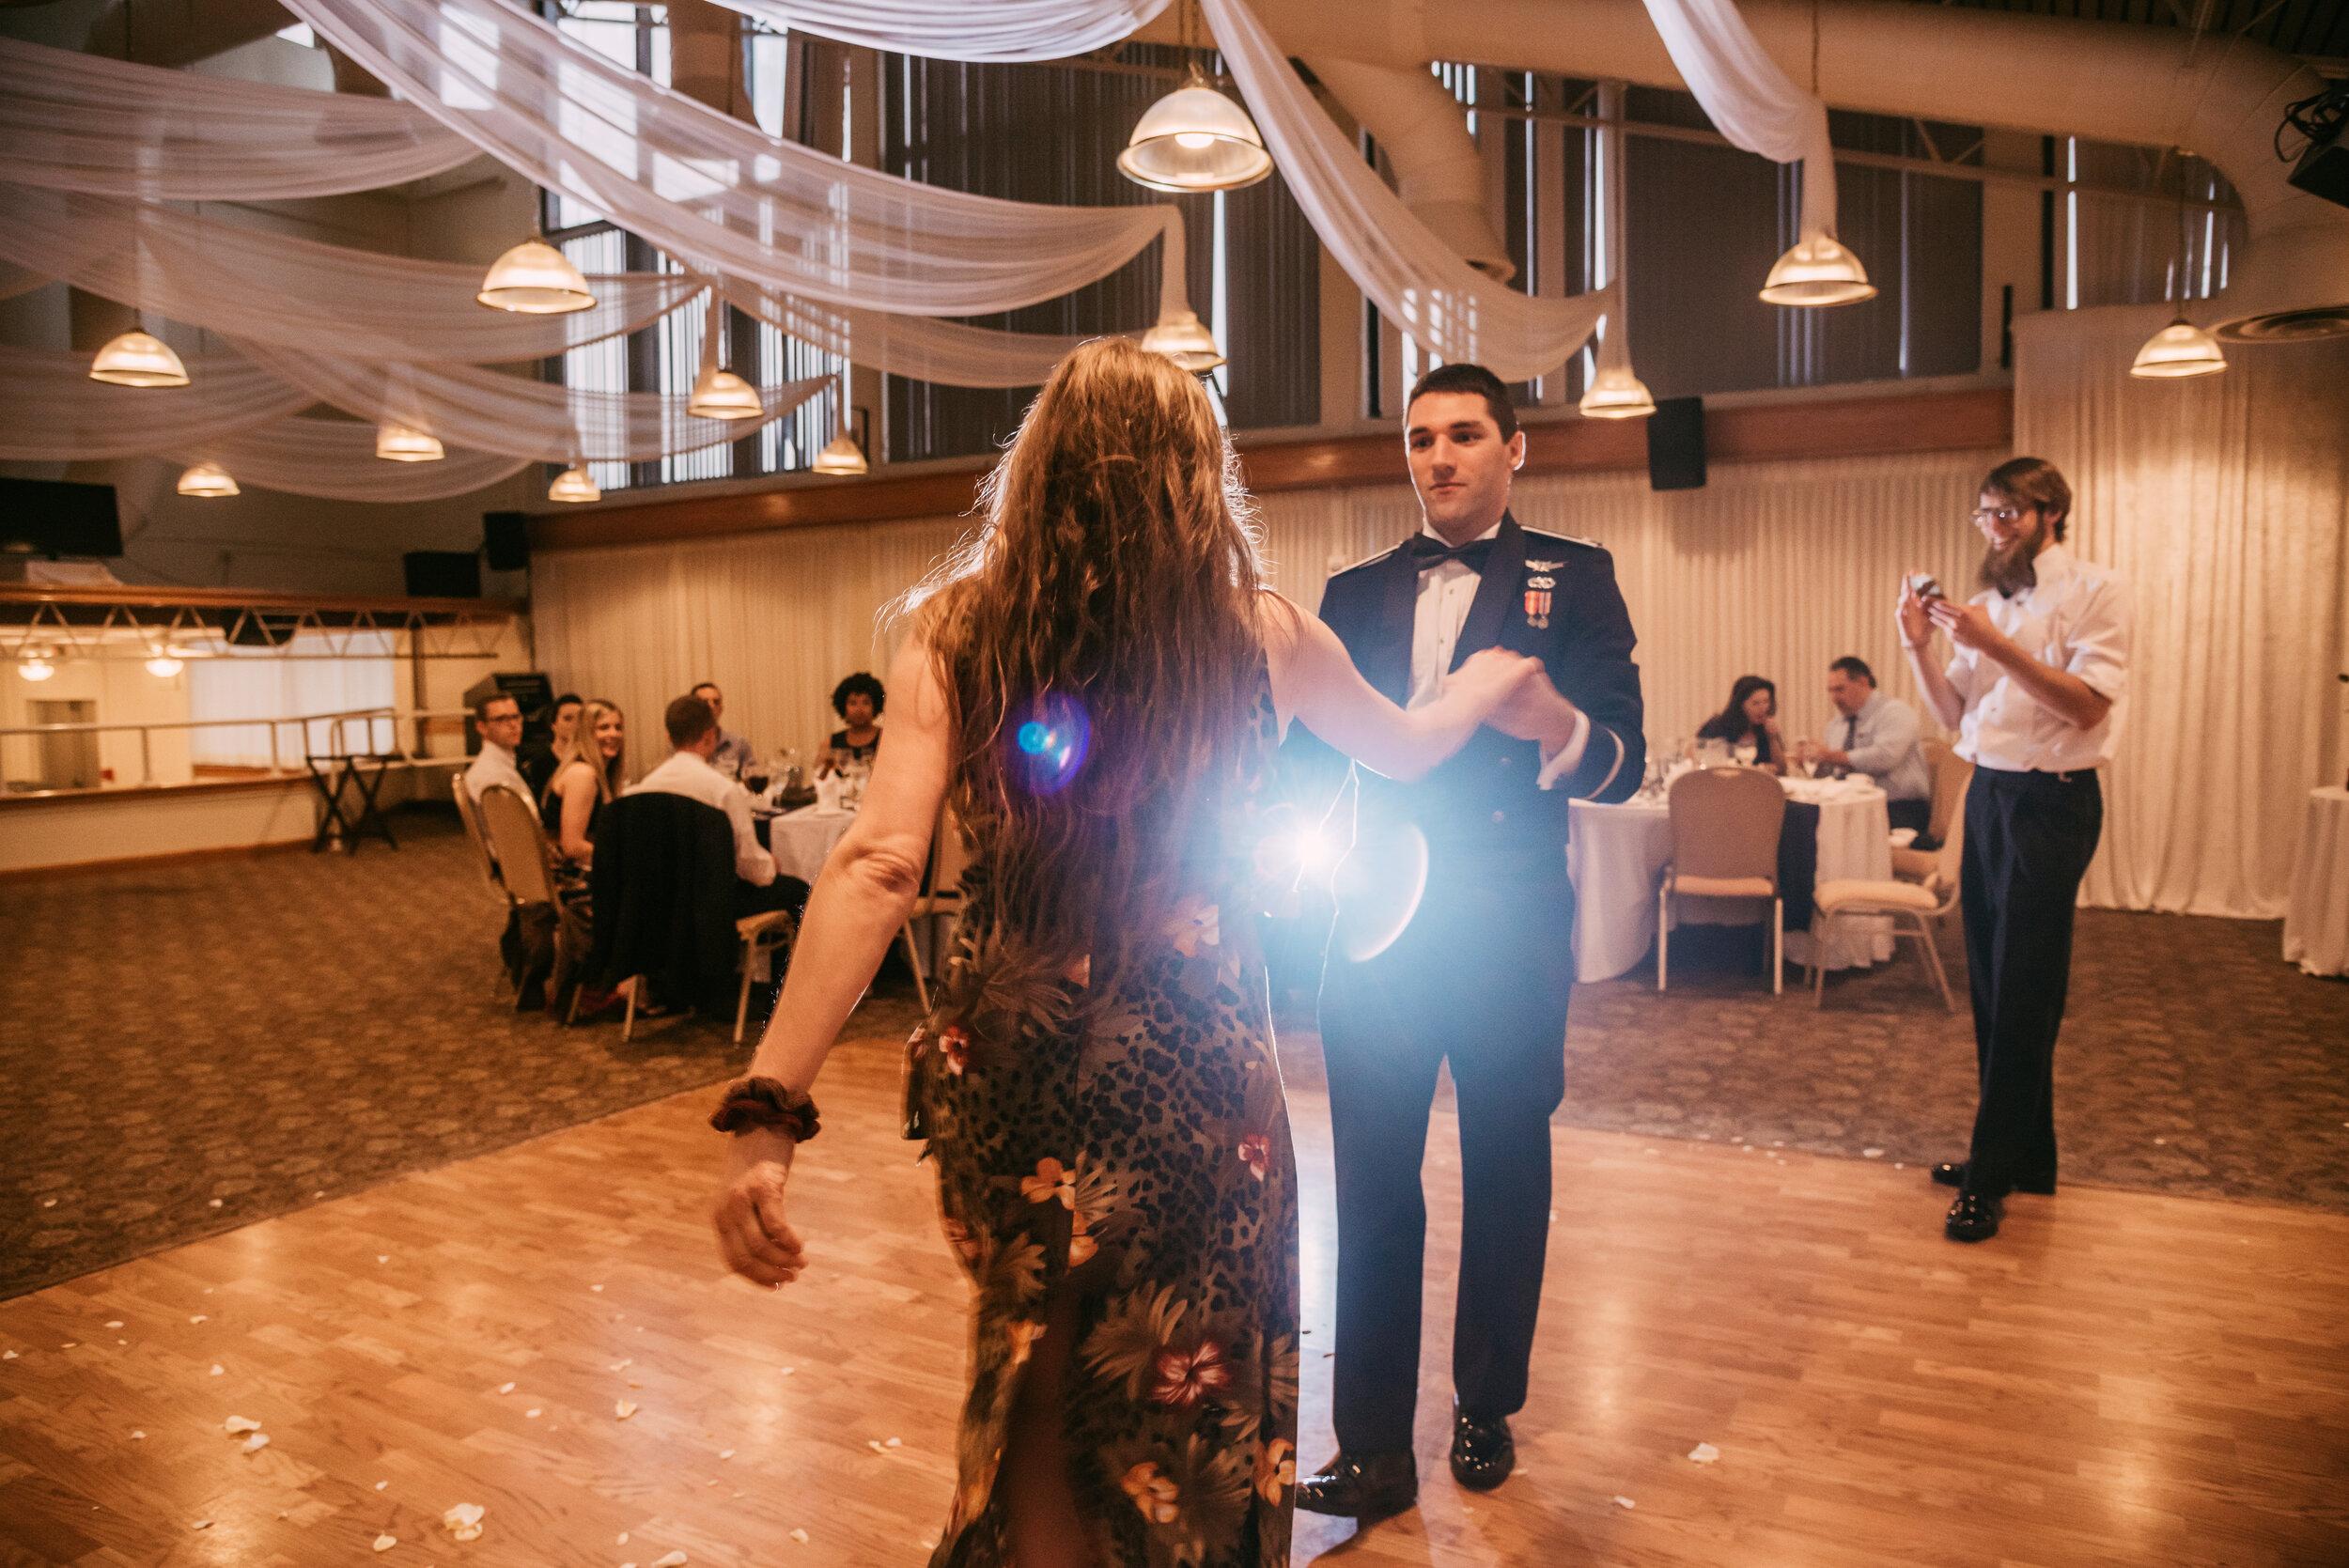 andru-the-tide-club-air-force-wedding-patrickafb-1-129.jpg